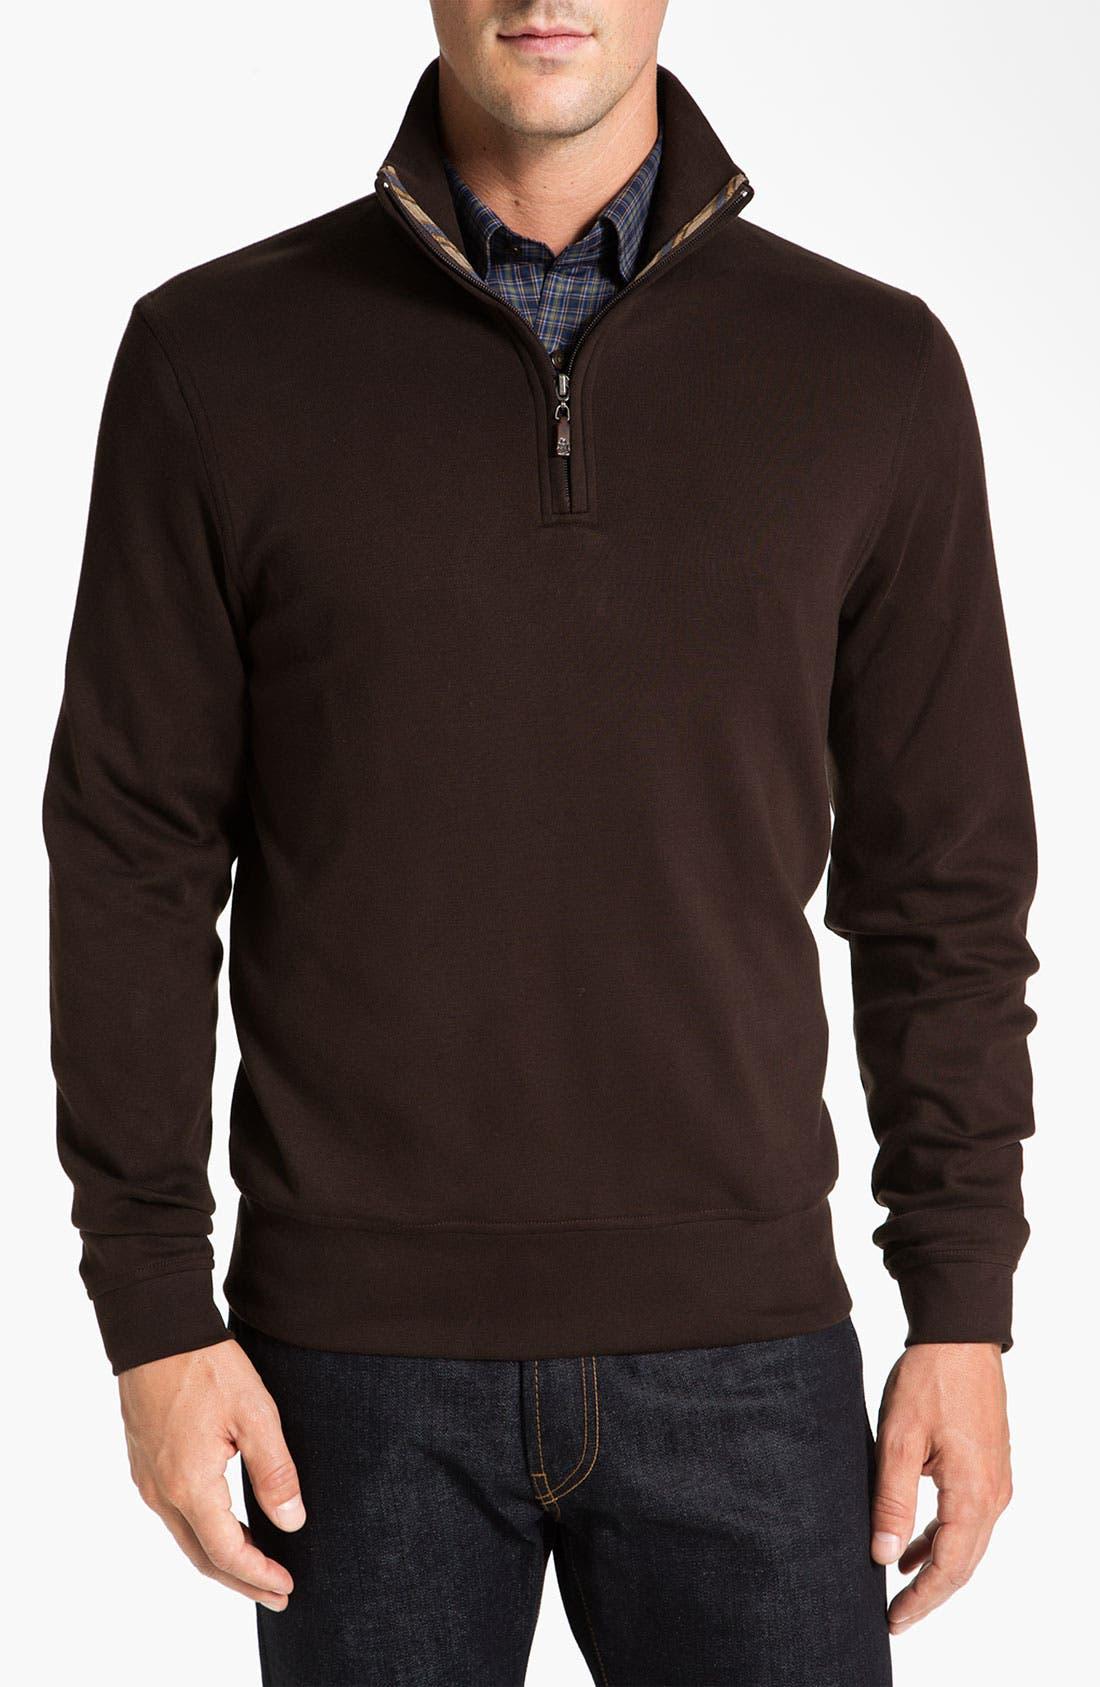 Alternate Image 1 Selected - Robert Talbott Quarter Zip Sweatshirt